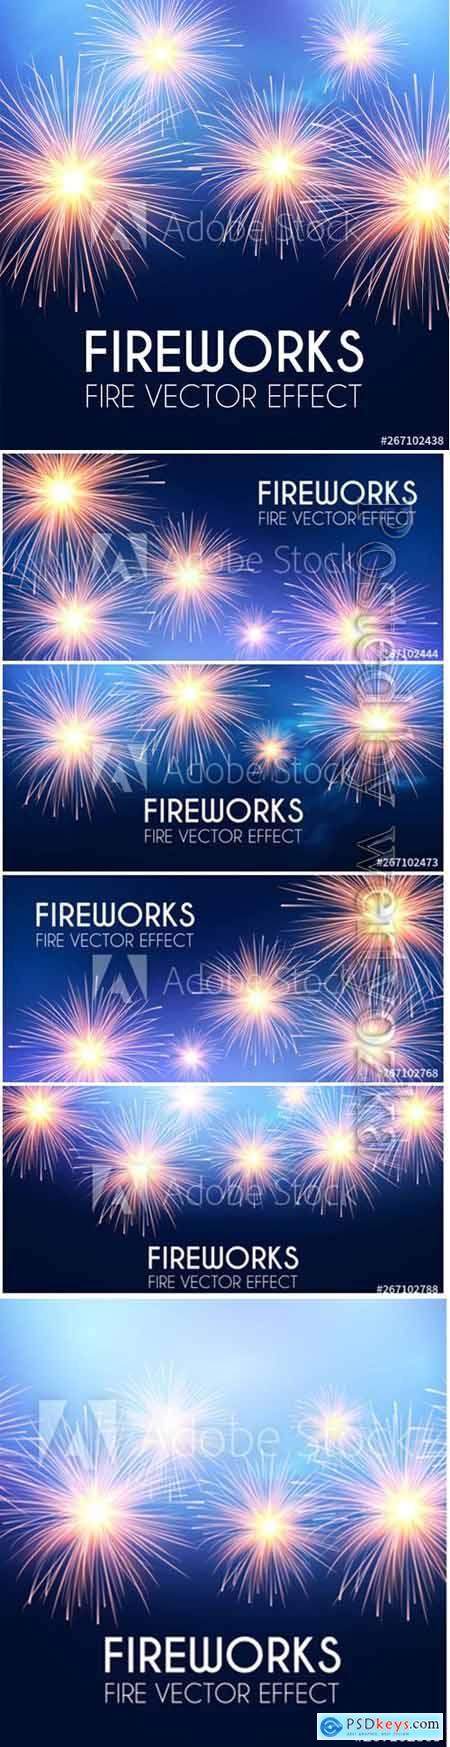 Sparkling fireworks on a blue vector background